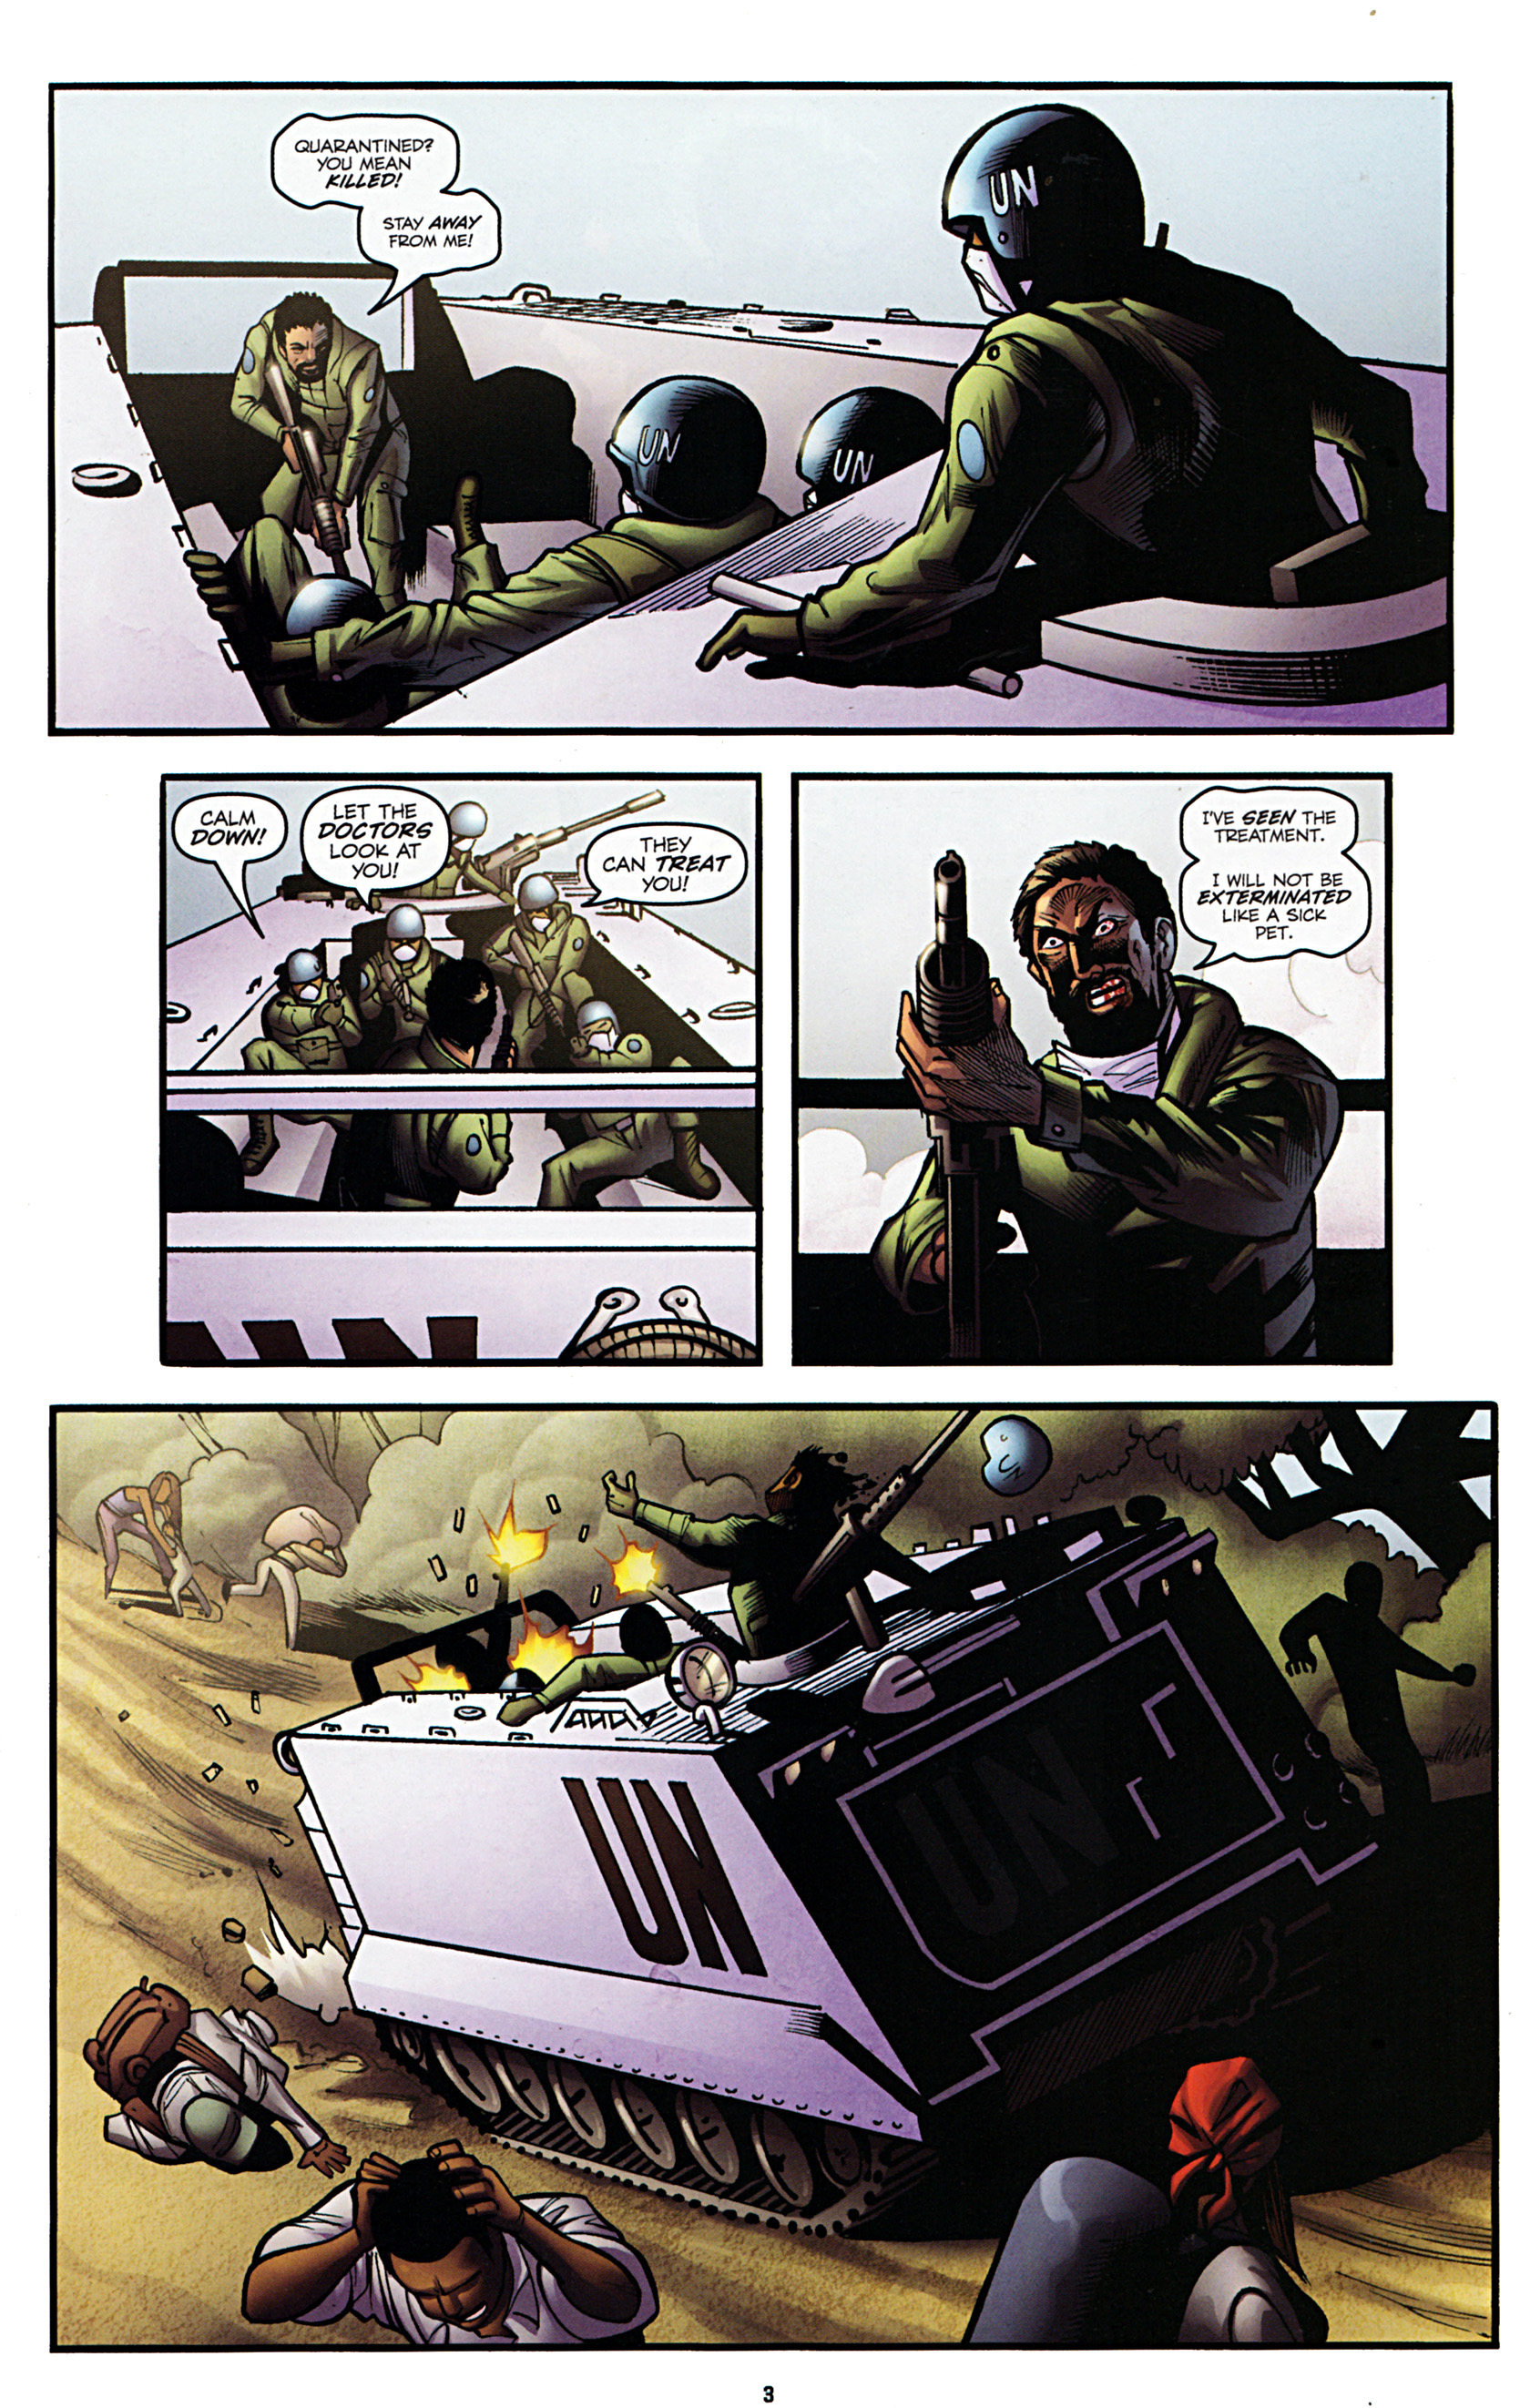 Read online G.I. Joe: Snake Eyes comic -  Issue #6 - 6